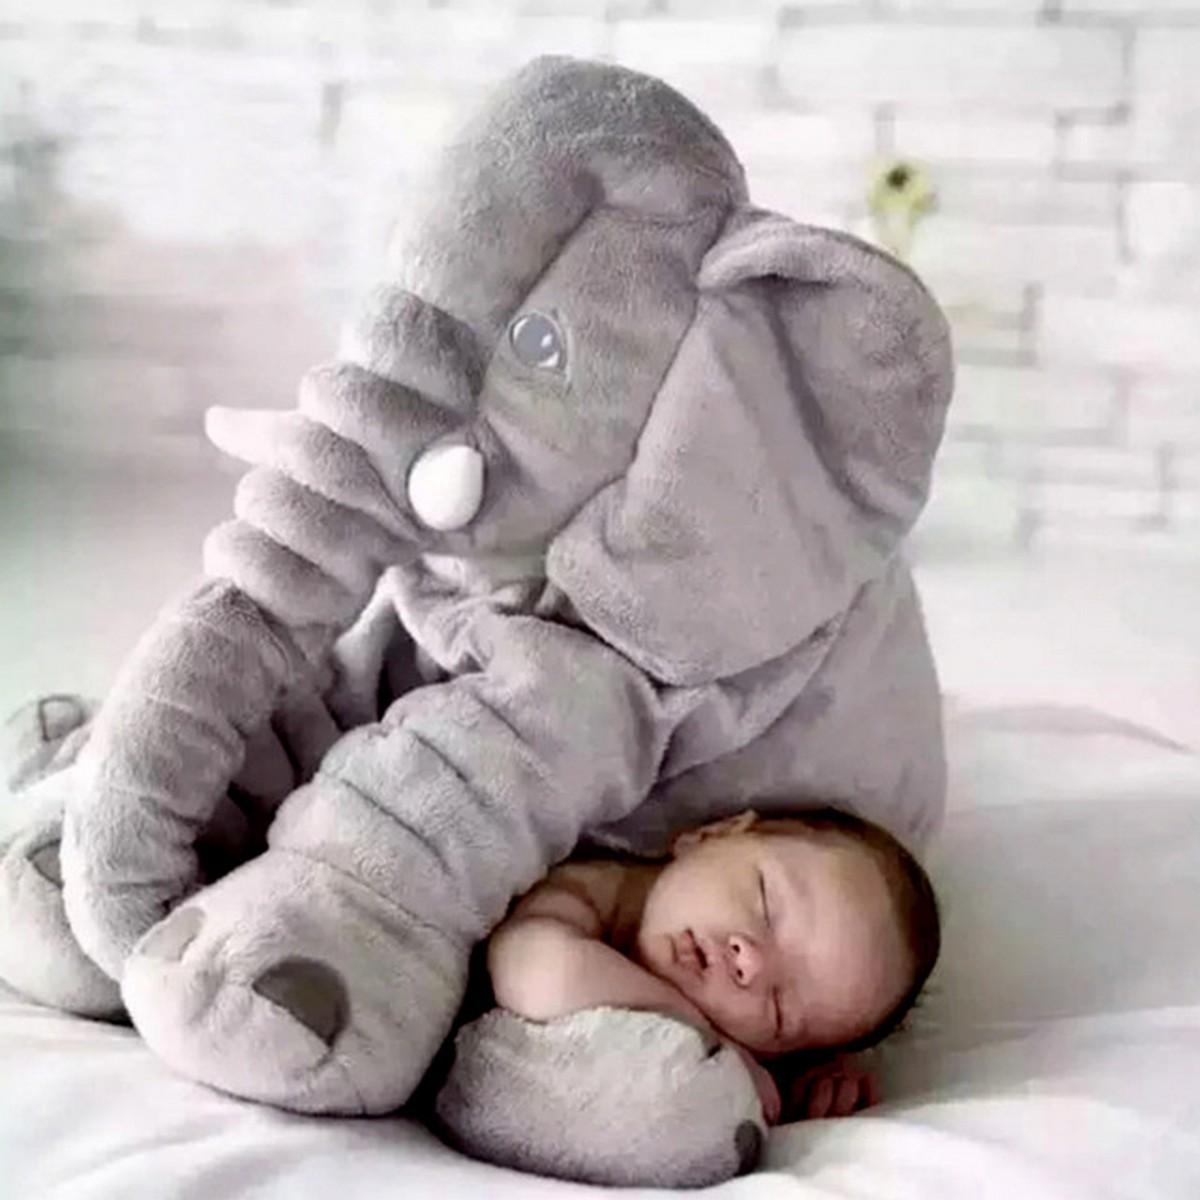 Creative Cute children bed Cushion Elephant Plush Toys Cute Dolls Soft Pillows Baby Sleeping Pillow baby birthday gift